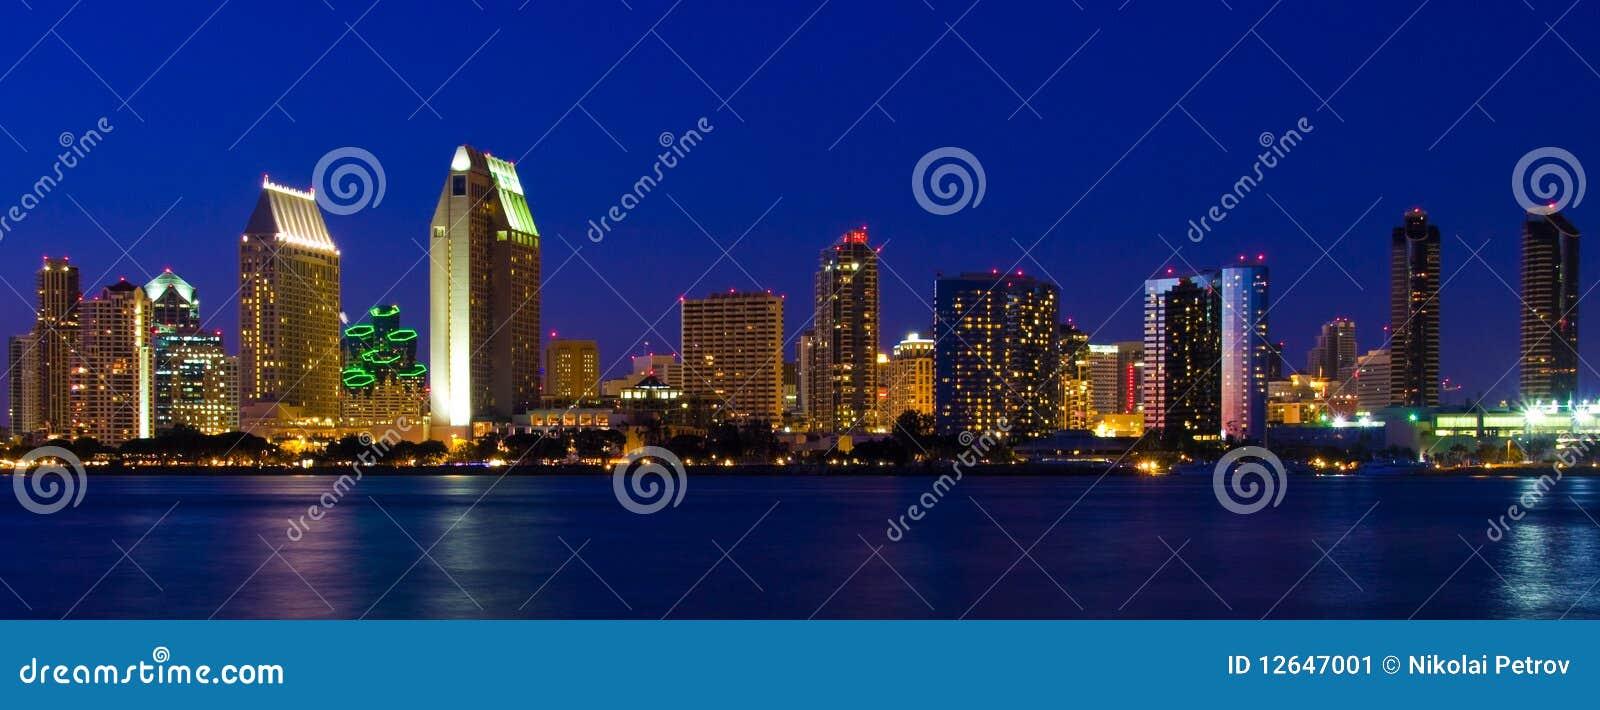 San Diego Downtown Harbor Coronado Bay Dusk Night